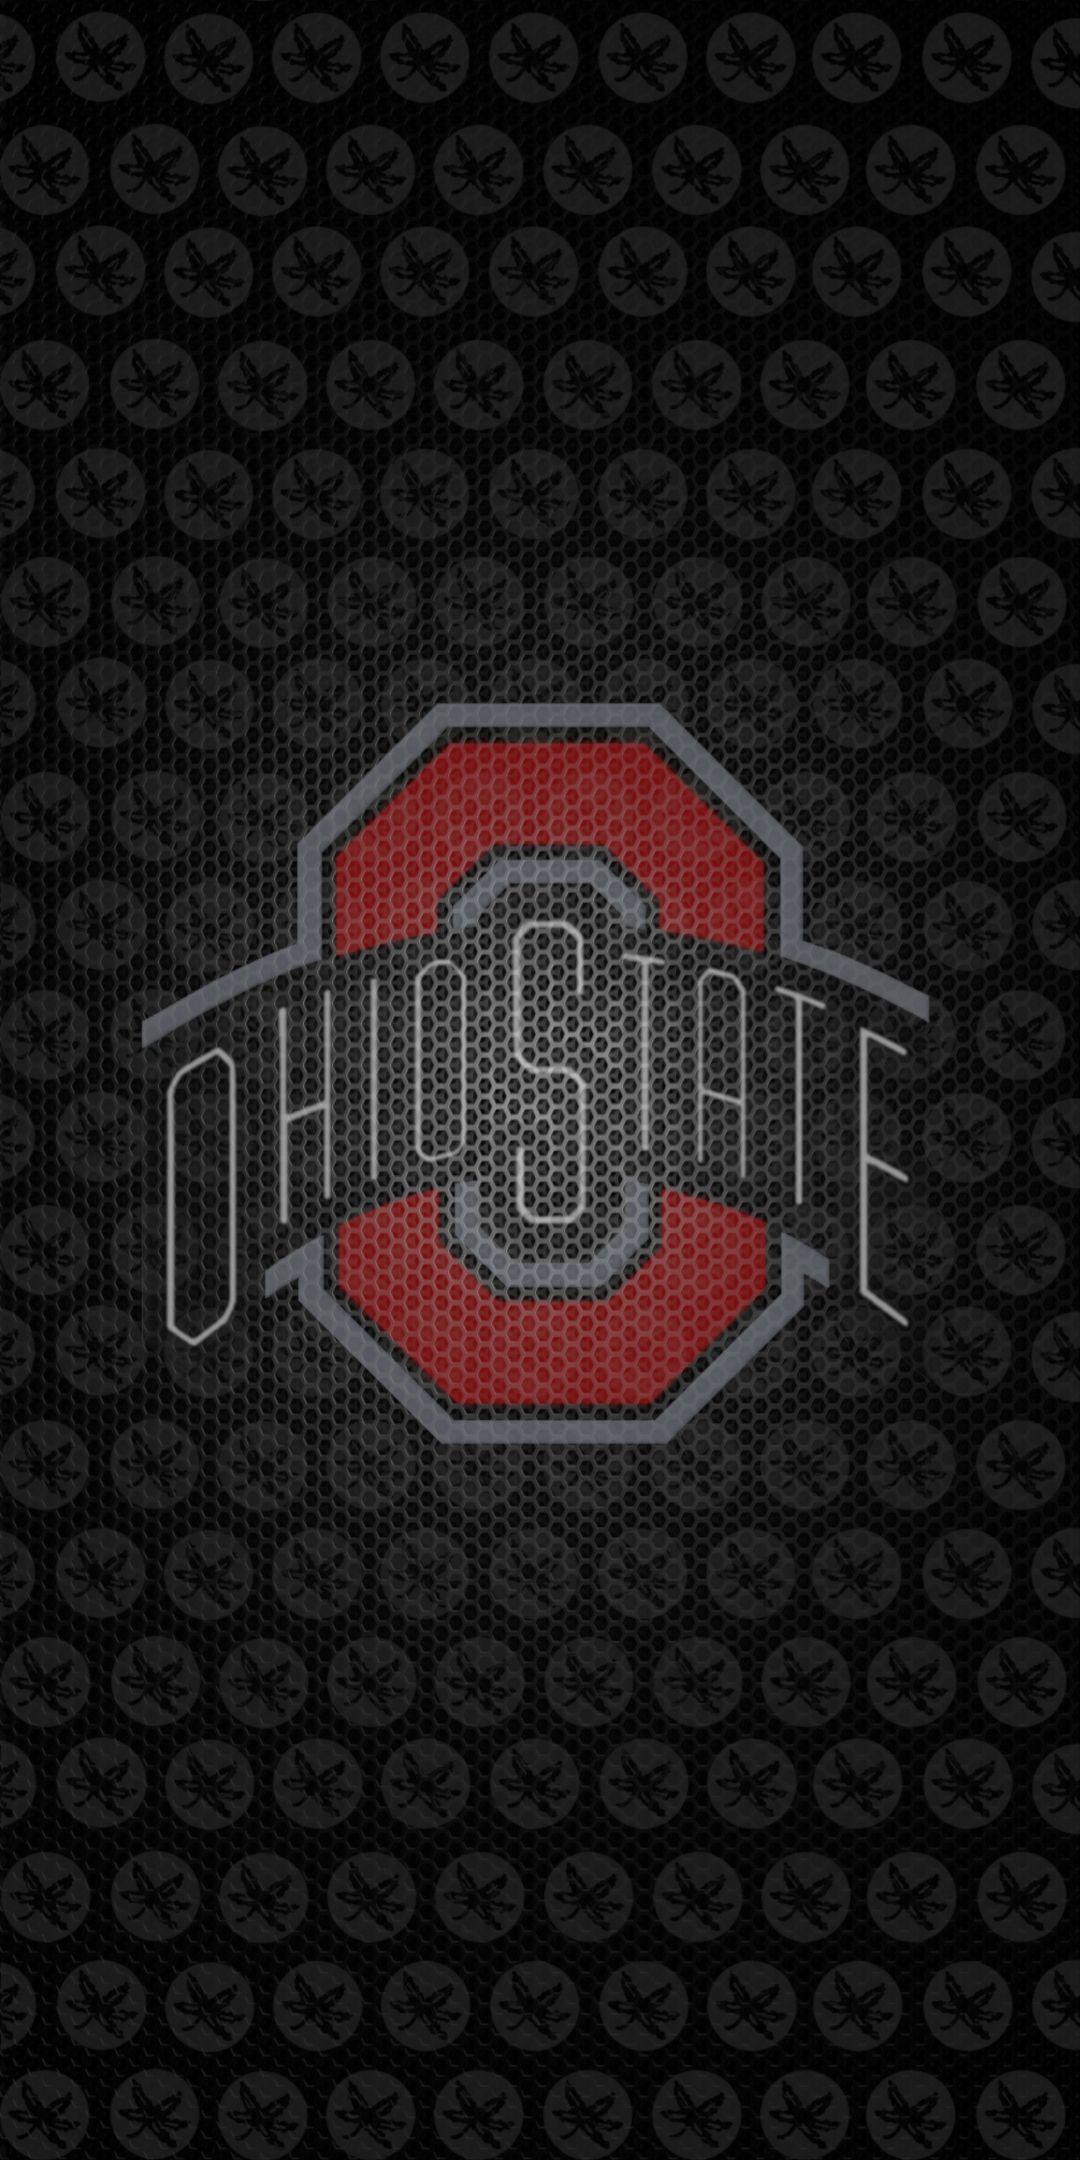 Osu Wallpaper 150 For Moto Z3 Ohio State Wallpaper Wallpaper Phone Wallpaper